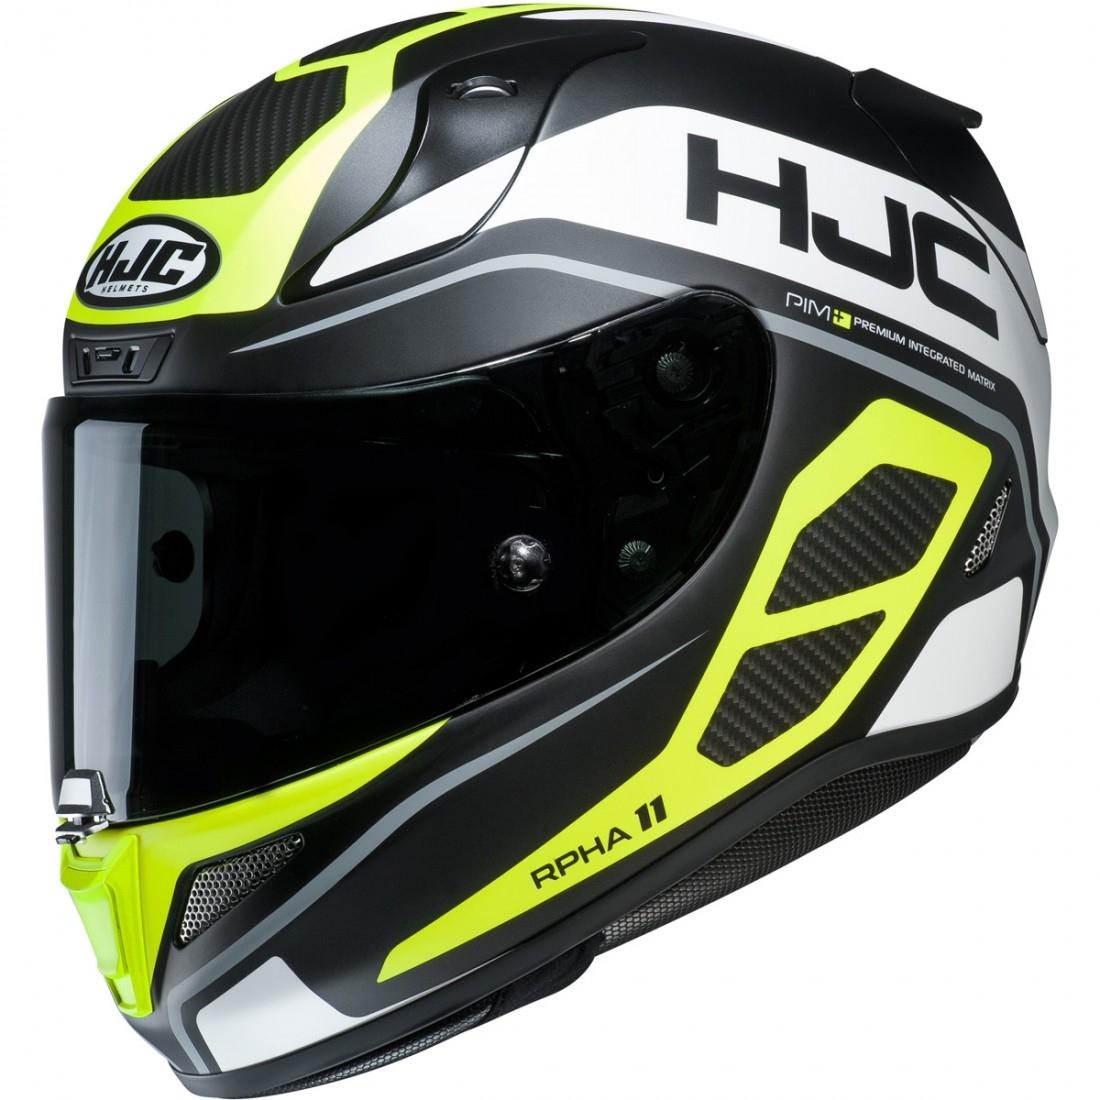 hjc rpha 11 saravo mc 4hsf helmet motocard. Black Bedroom Furniture Sets. Home Design Ideas